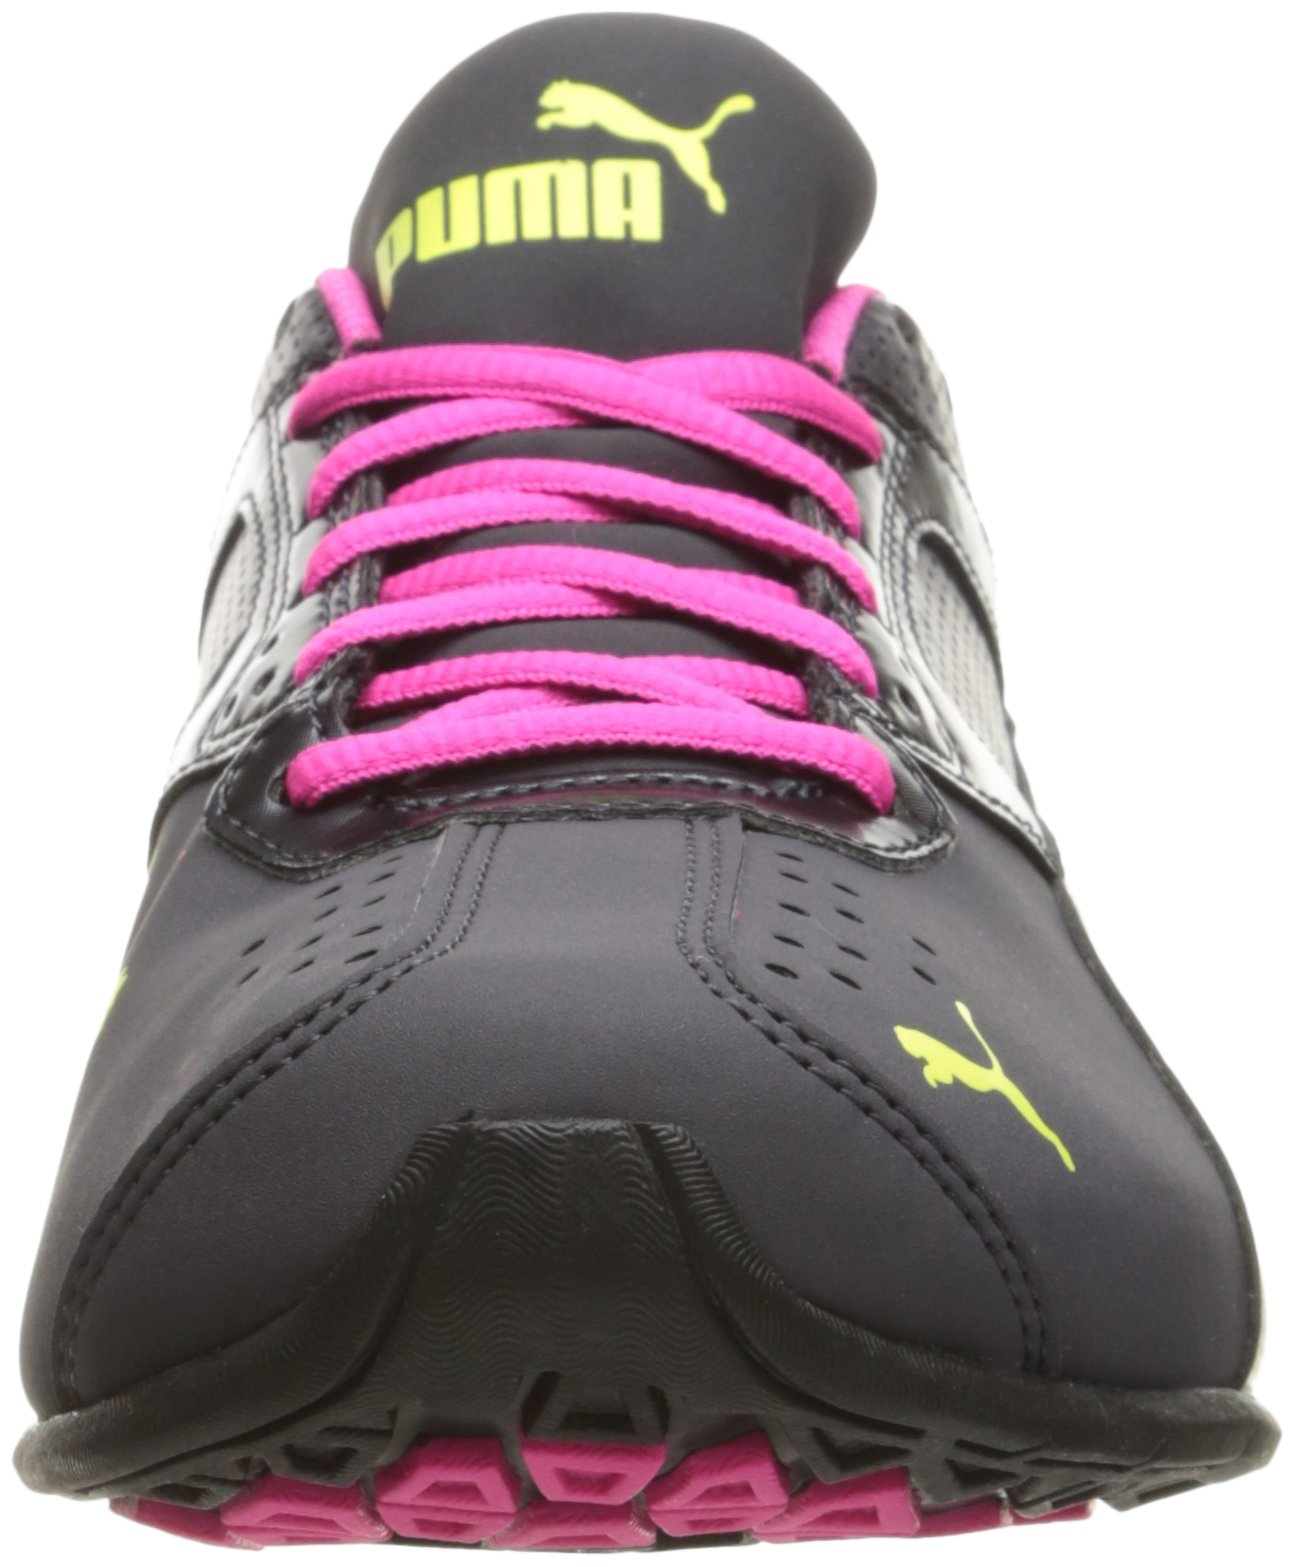 PUMA Women's Tazon 6 WN's fm Sneaker, Periscope Silver-Pink glo, 7 M US by PUMA (Image #4)